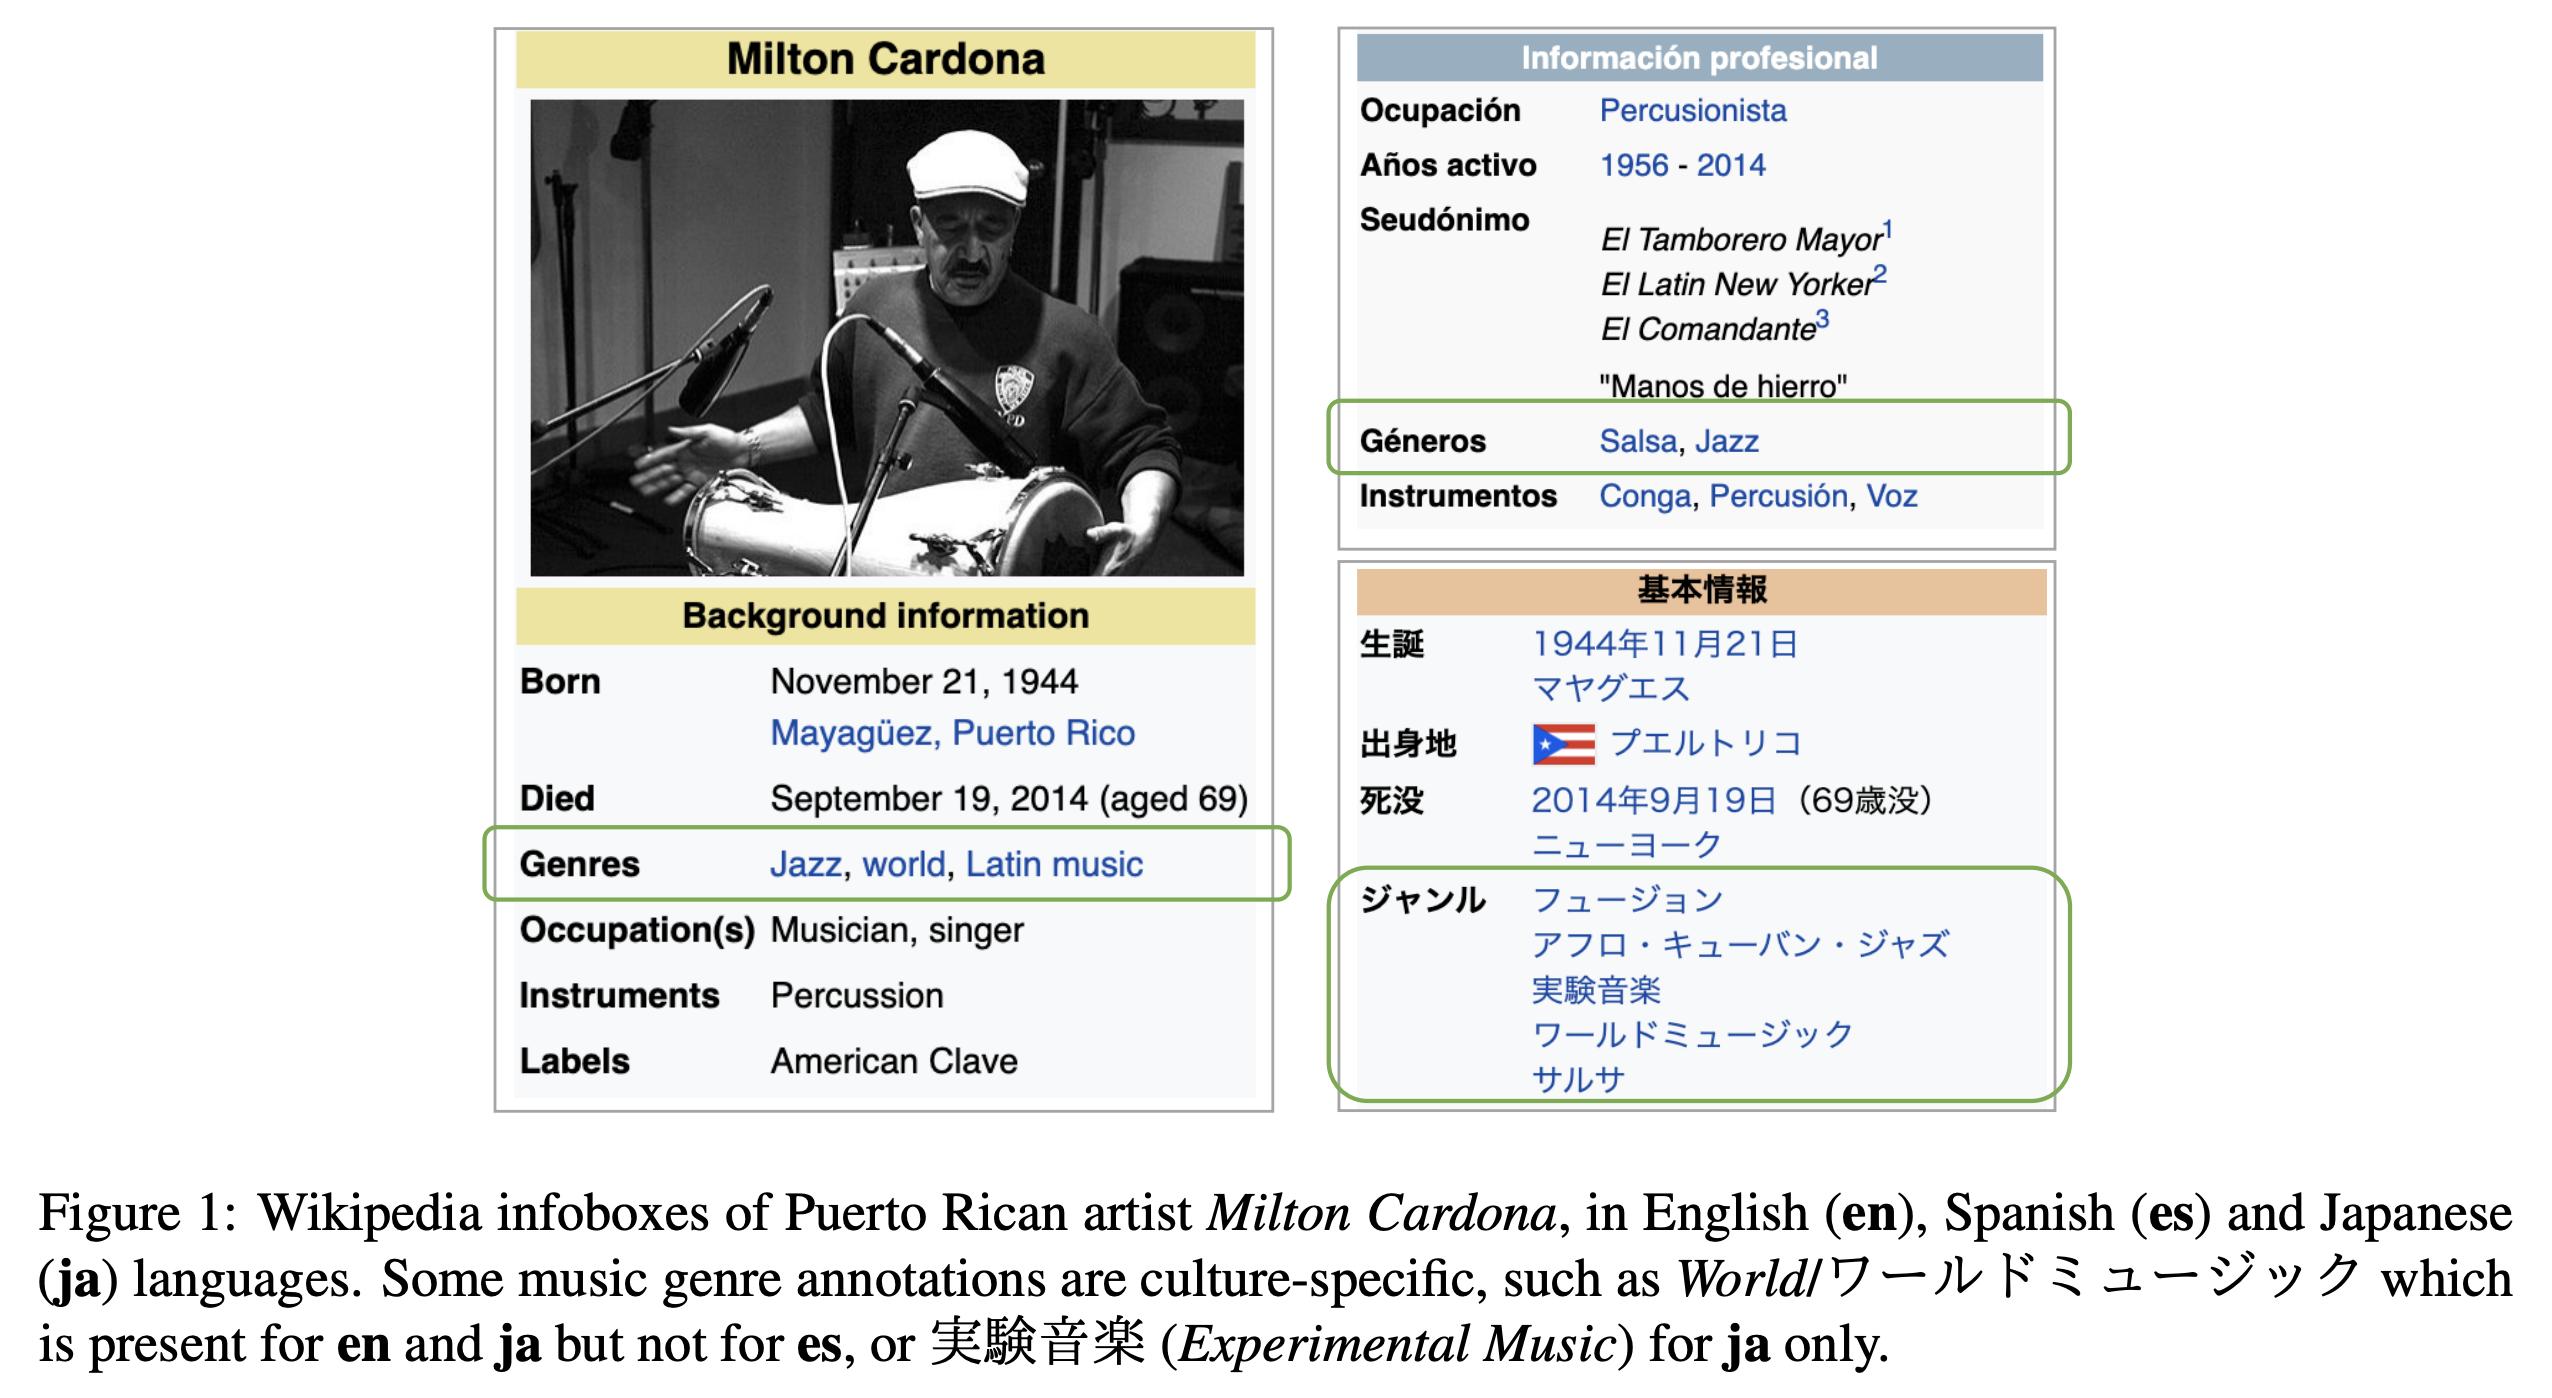 Wikipedia infoboxes of Puerto Rican artist Milton Cardona